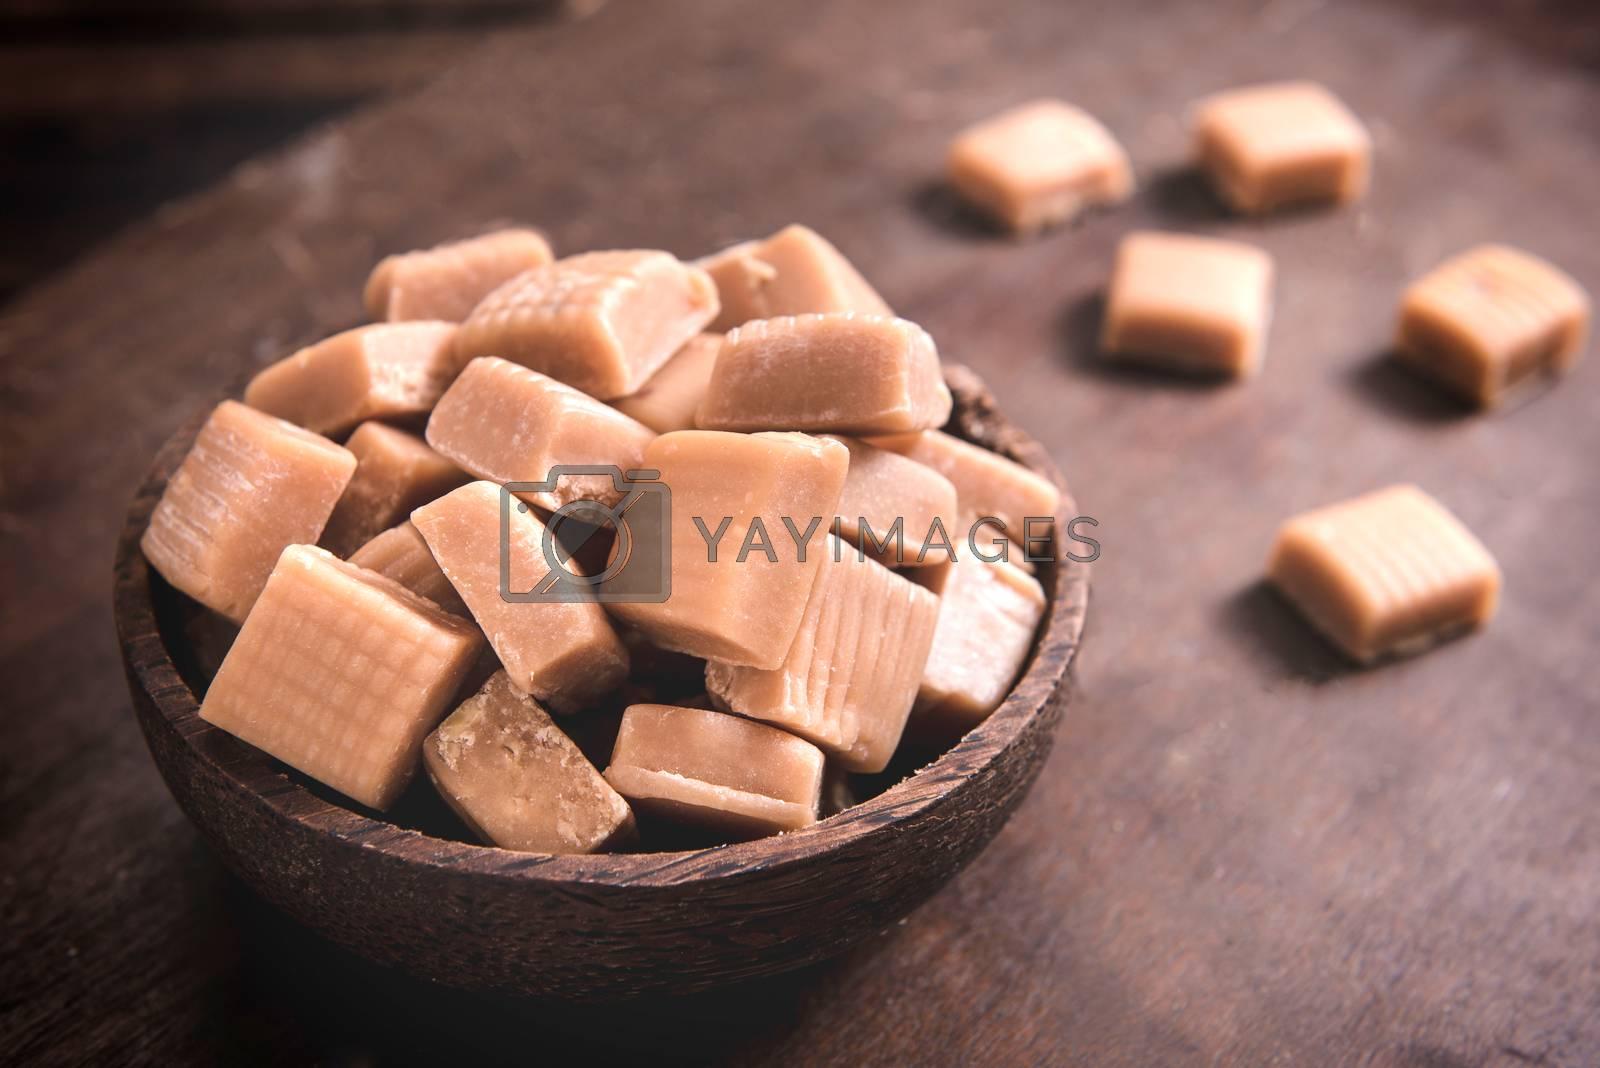 Milk and caramel handmade bonbons on wooden background,